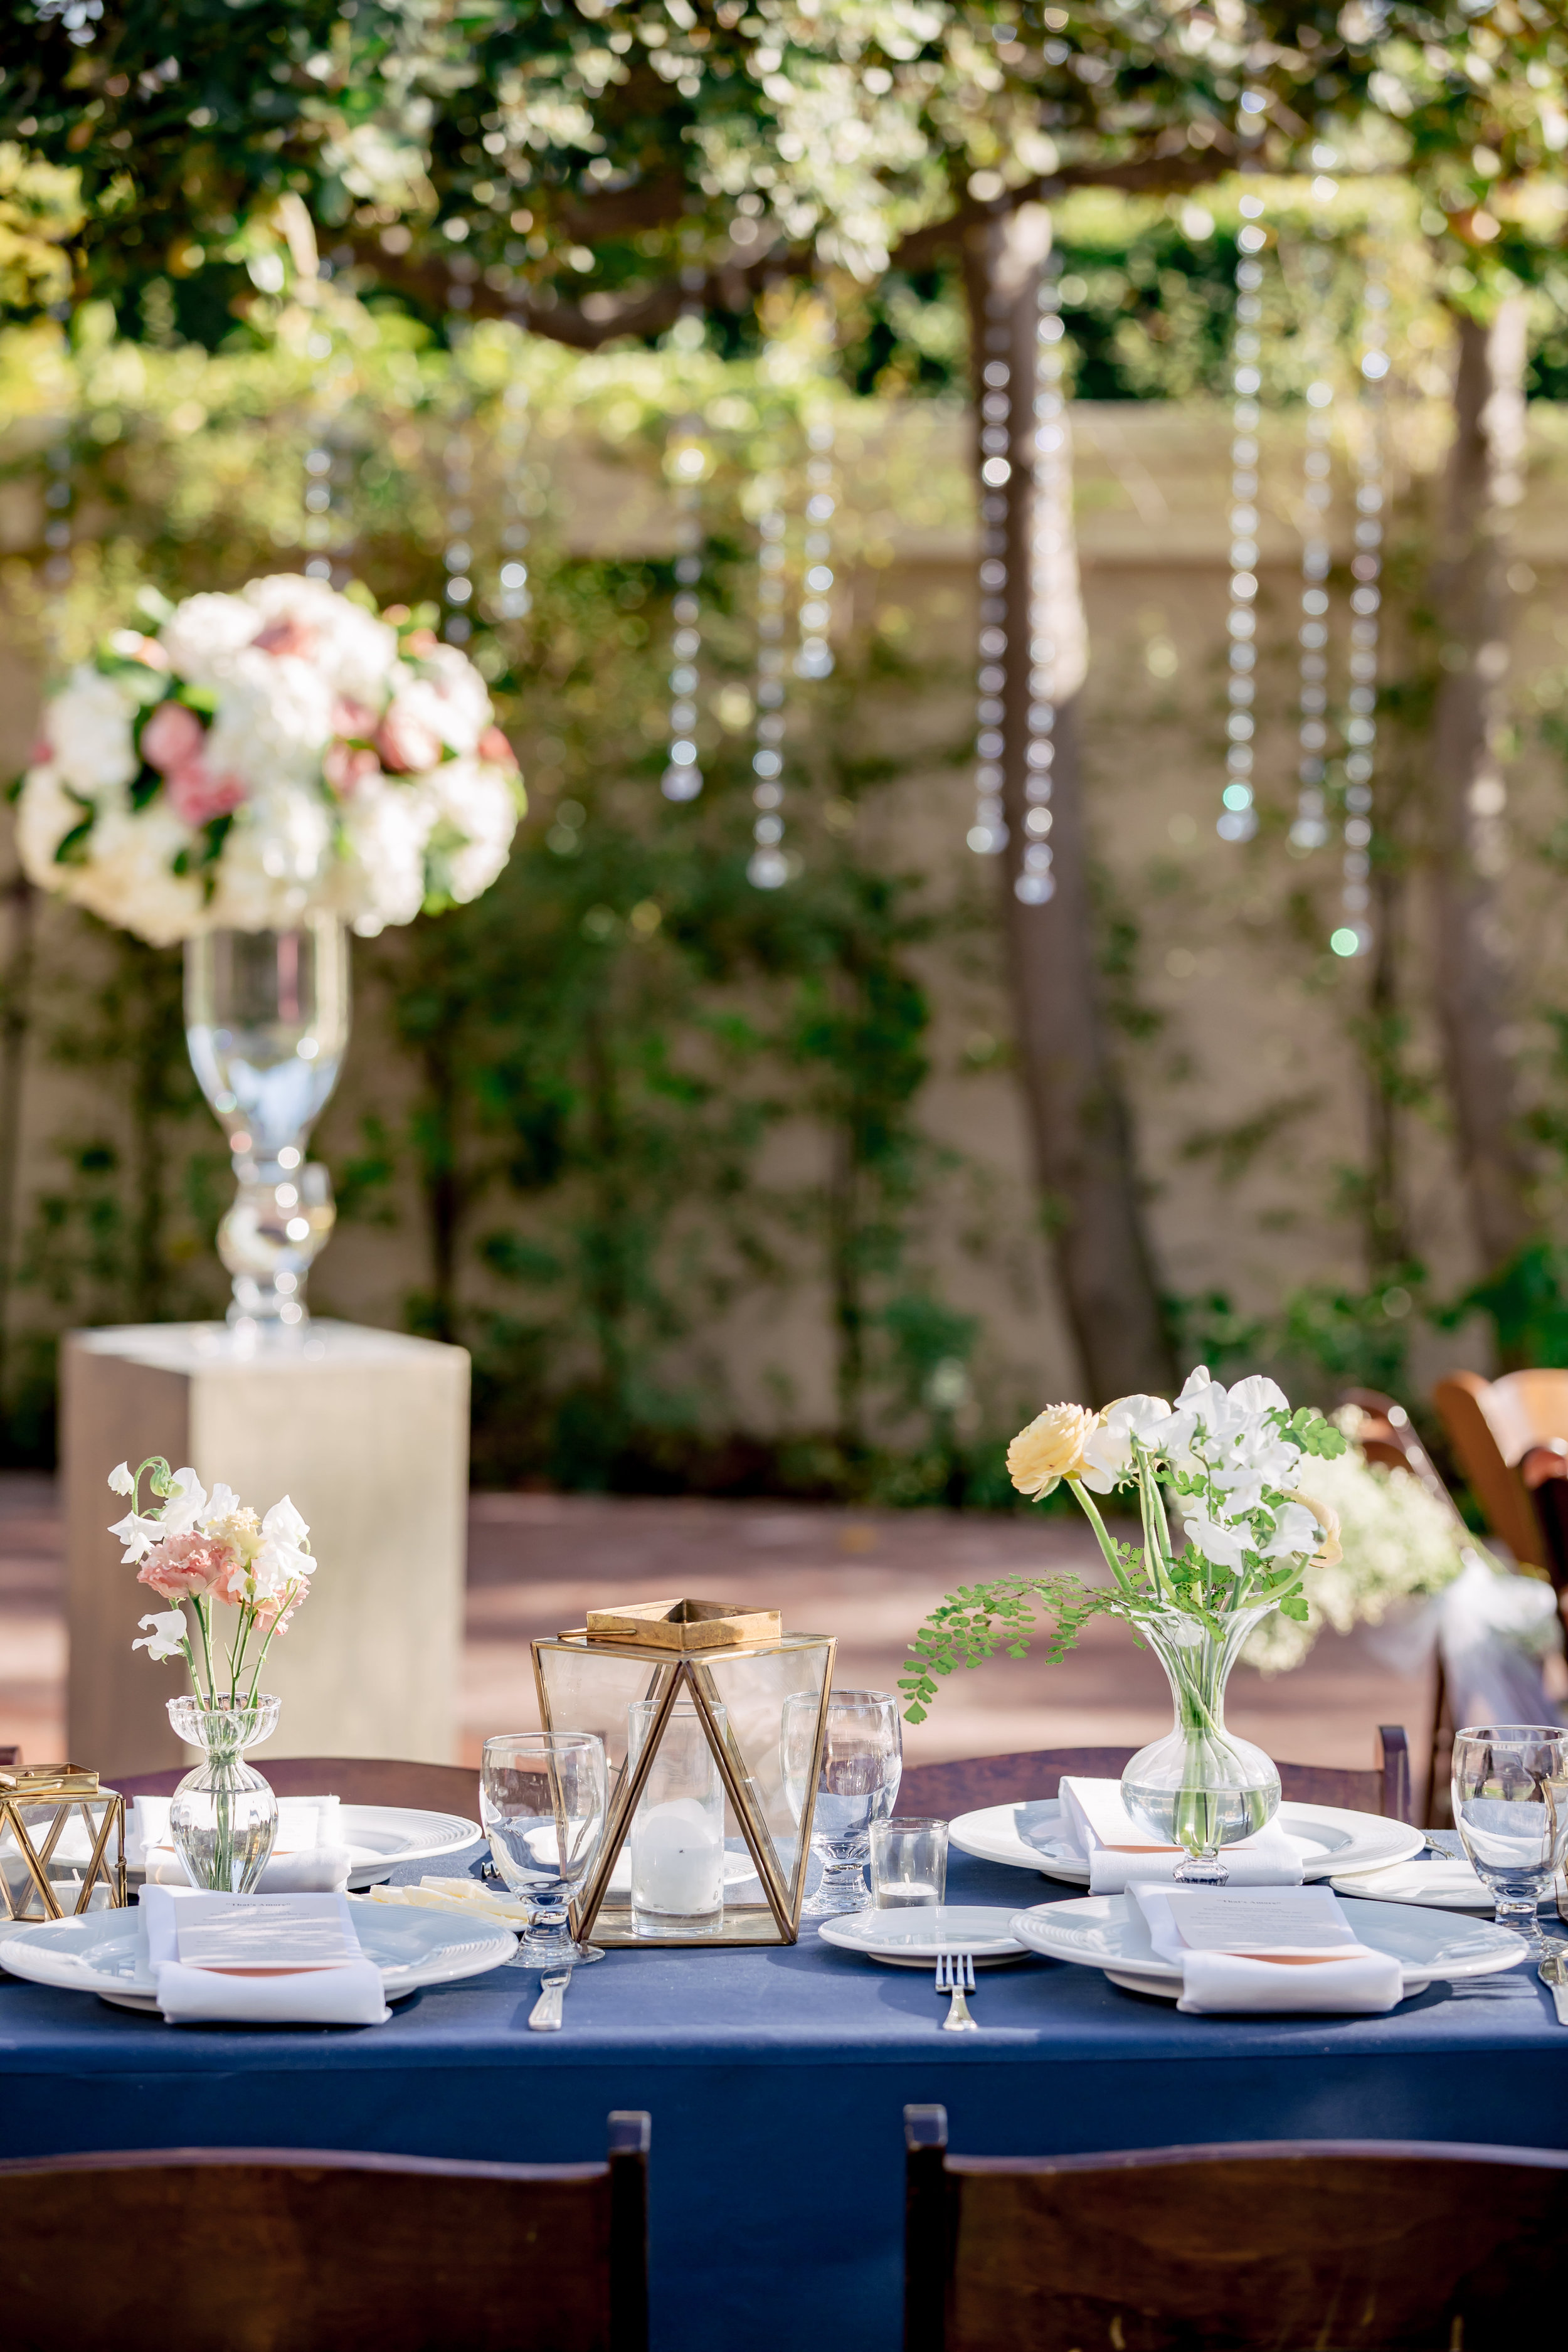 www.SantaBarbaraWeddingStyle.com | Rewind Photography | The Santa Barbara Club | Cocorose Design | Alegria by Design | Pink and Navy Wedding